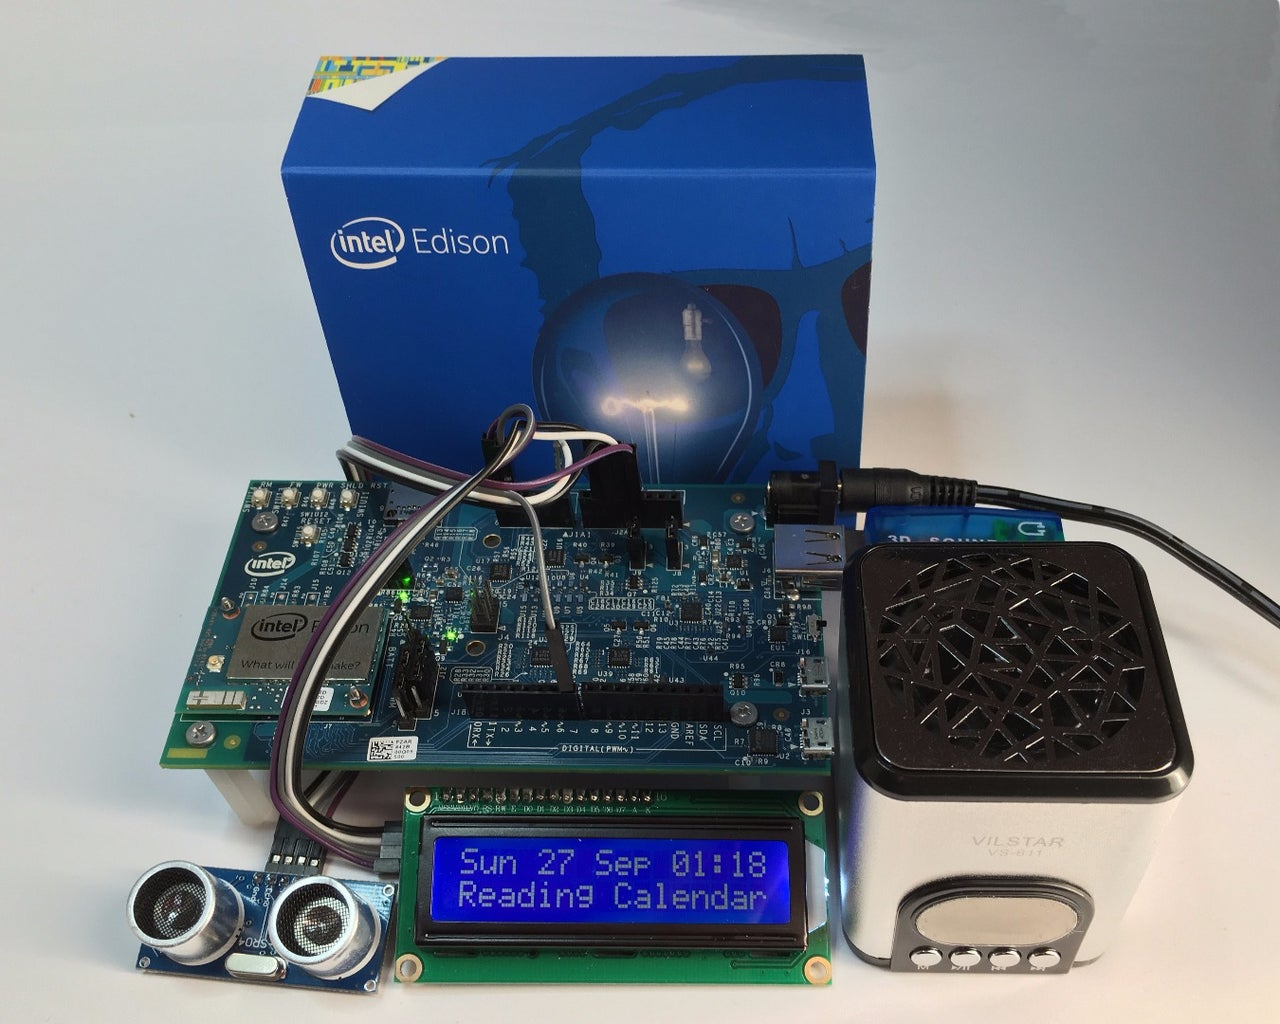 Intel Edison, Proximity Activated, Speaking Calendar